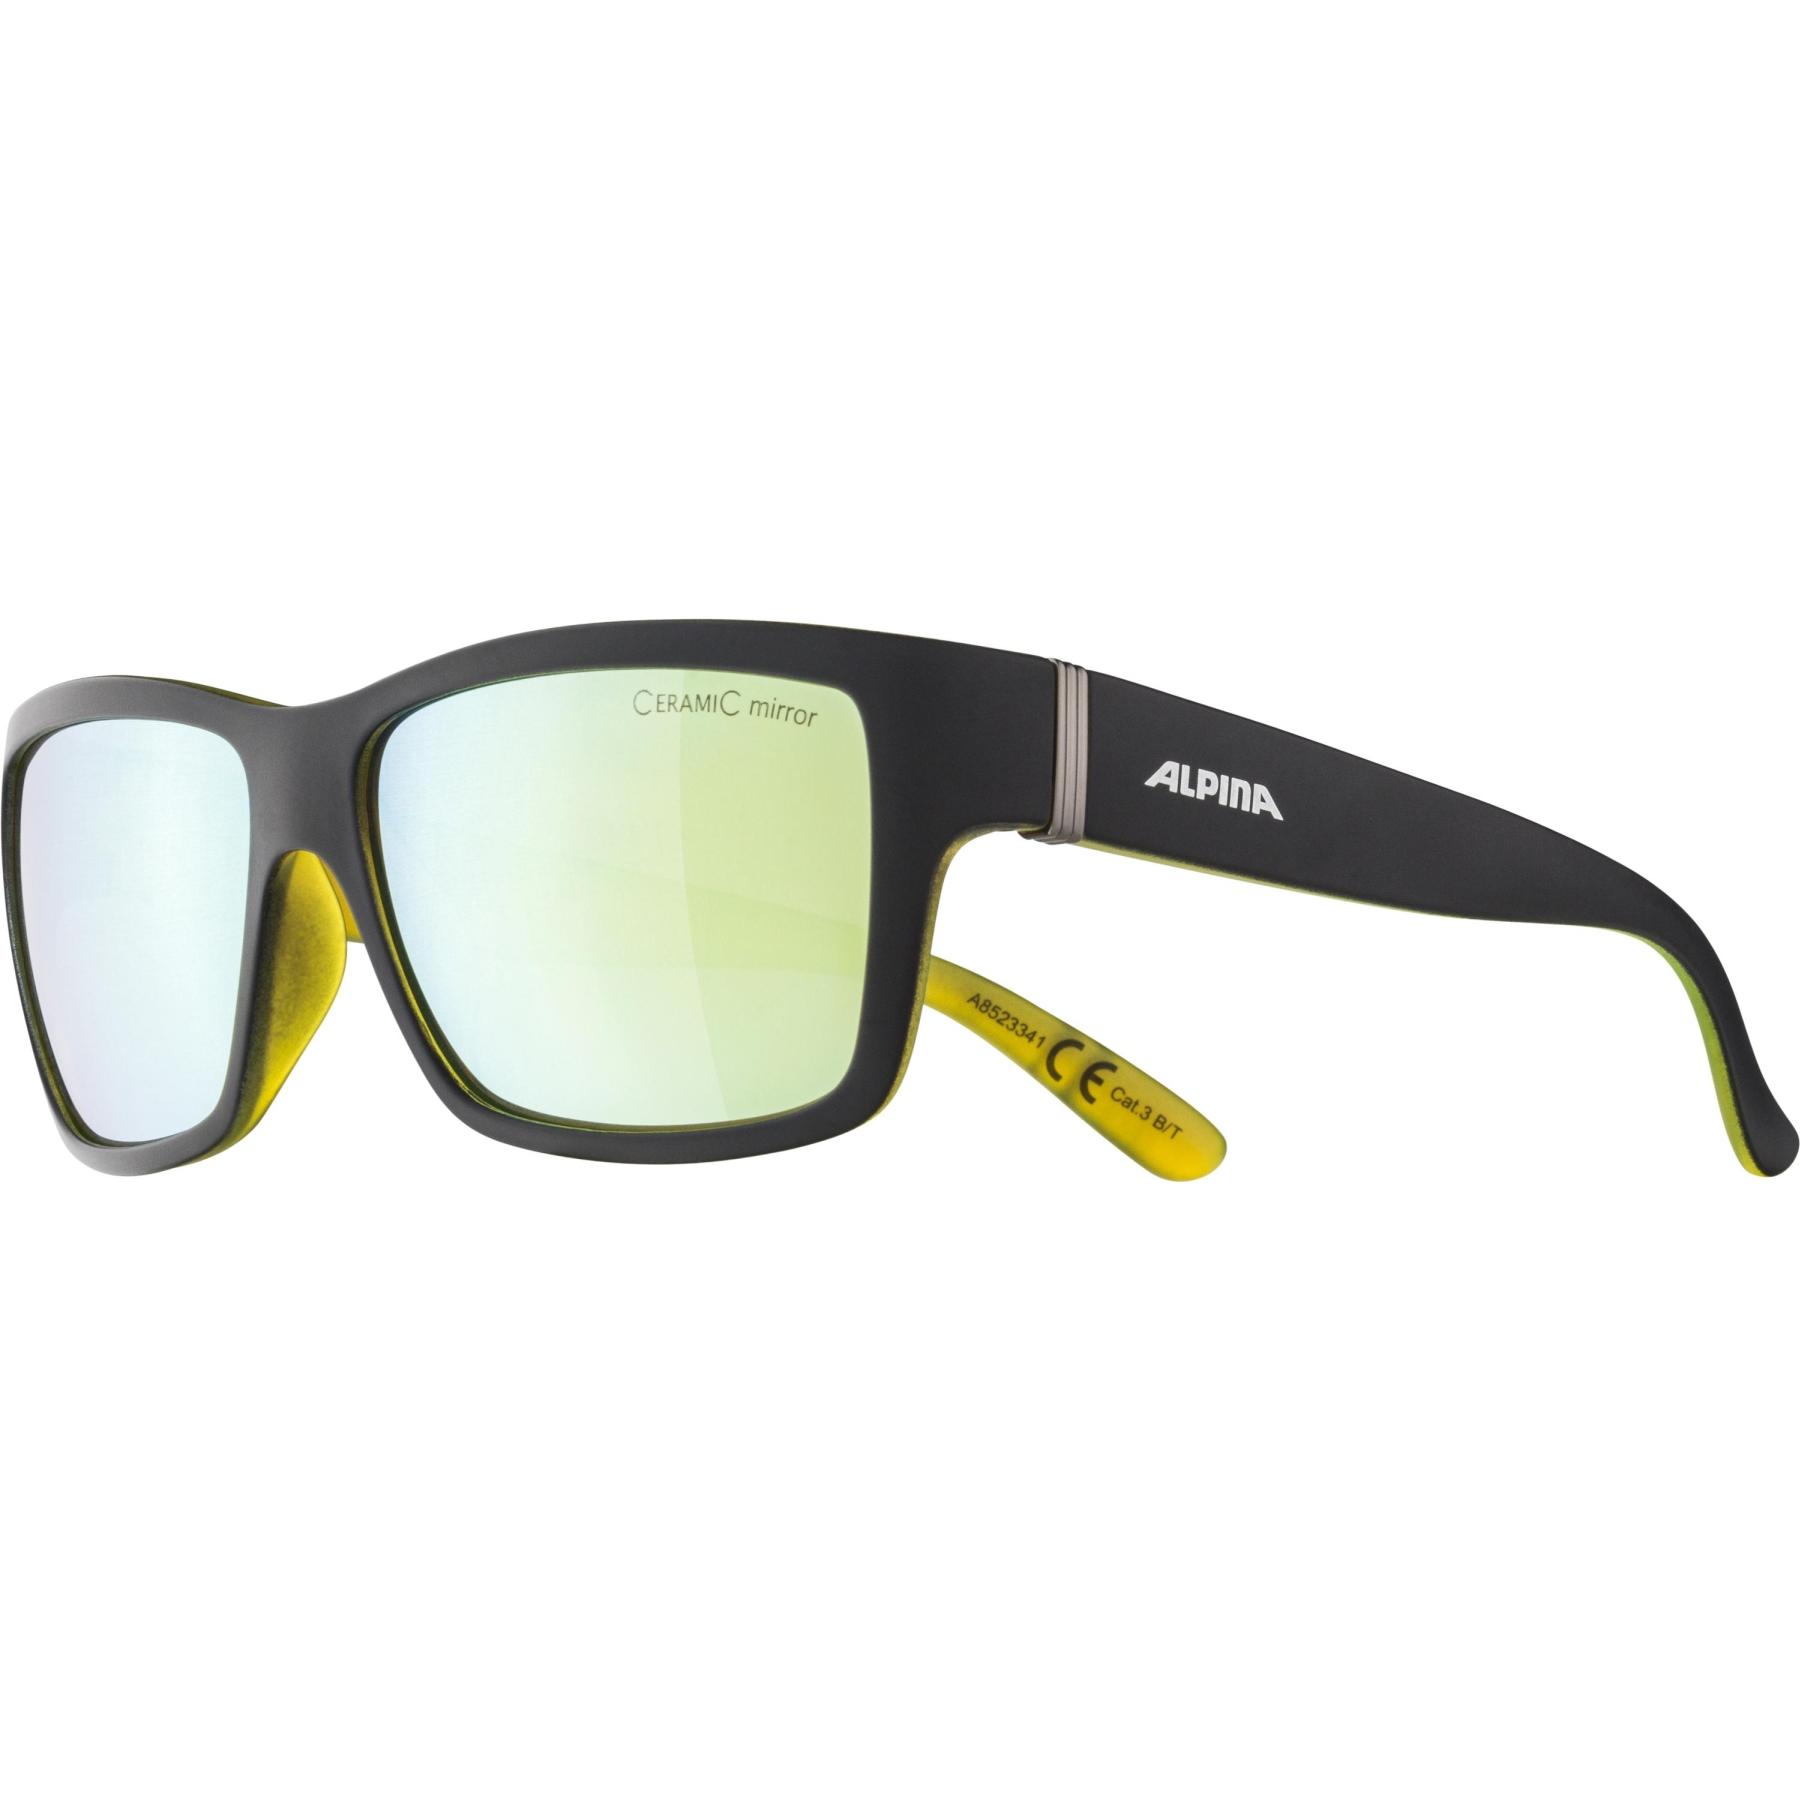 Image of Alpina Kacey Glasses - Black Matt-Neon/CeramiC Gold Mirror